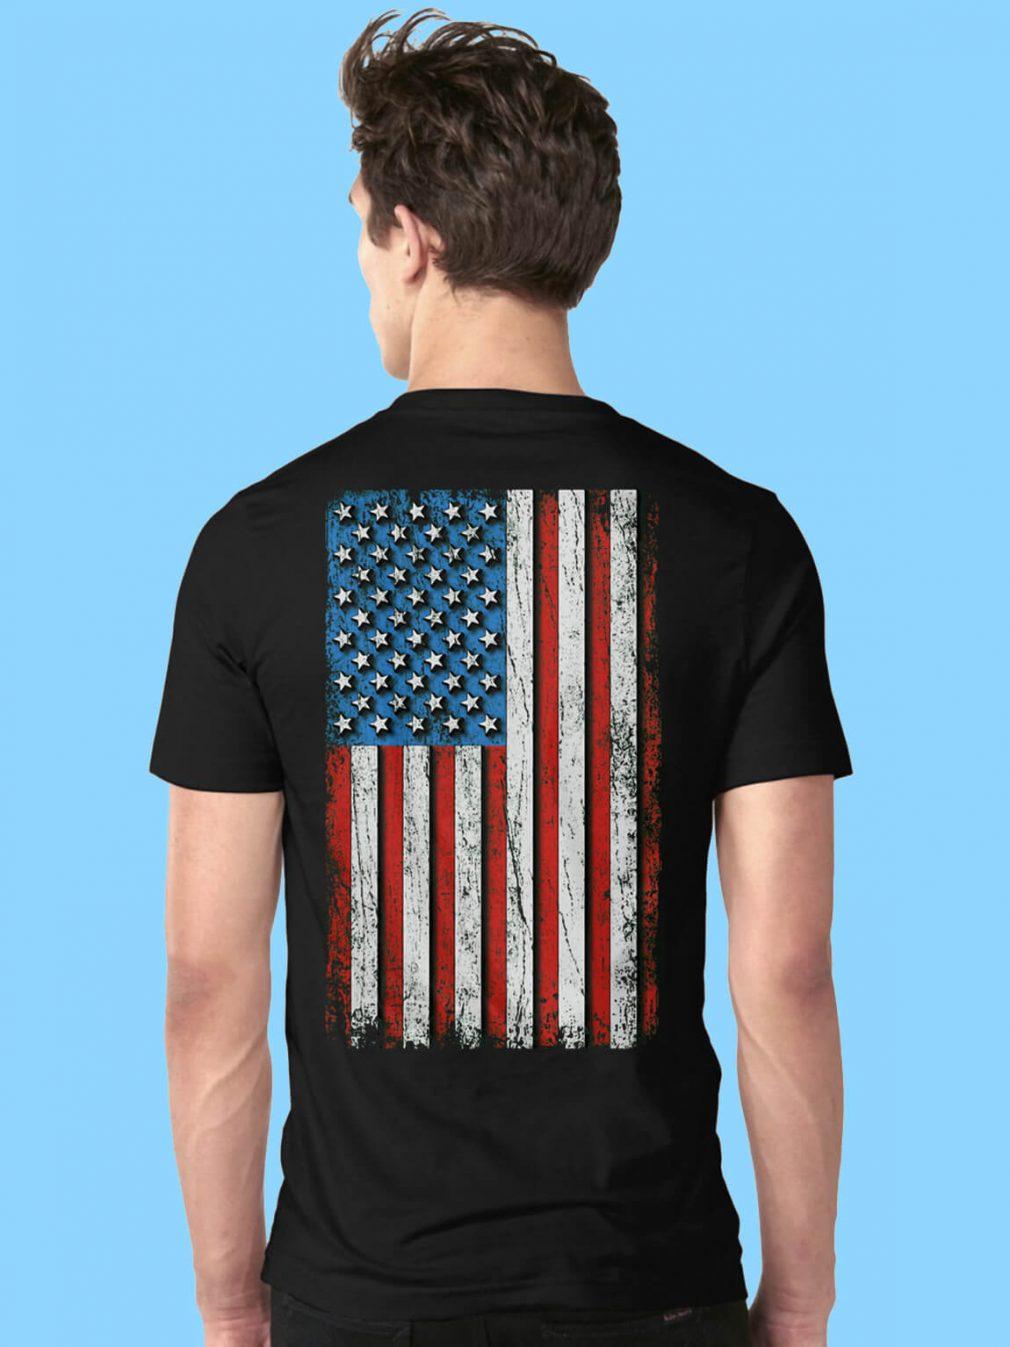 Trump a real American hero shirt